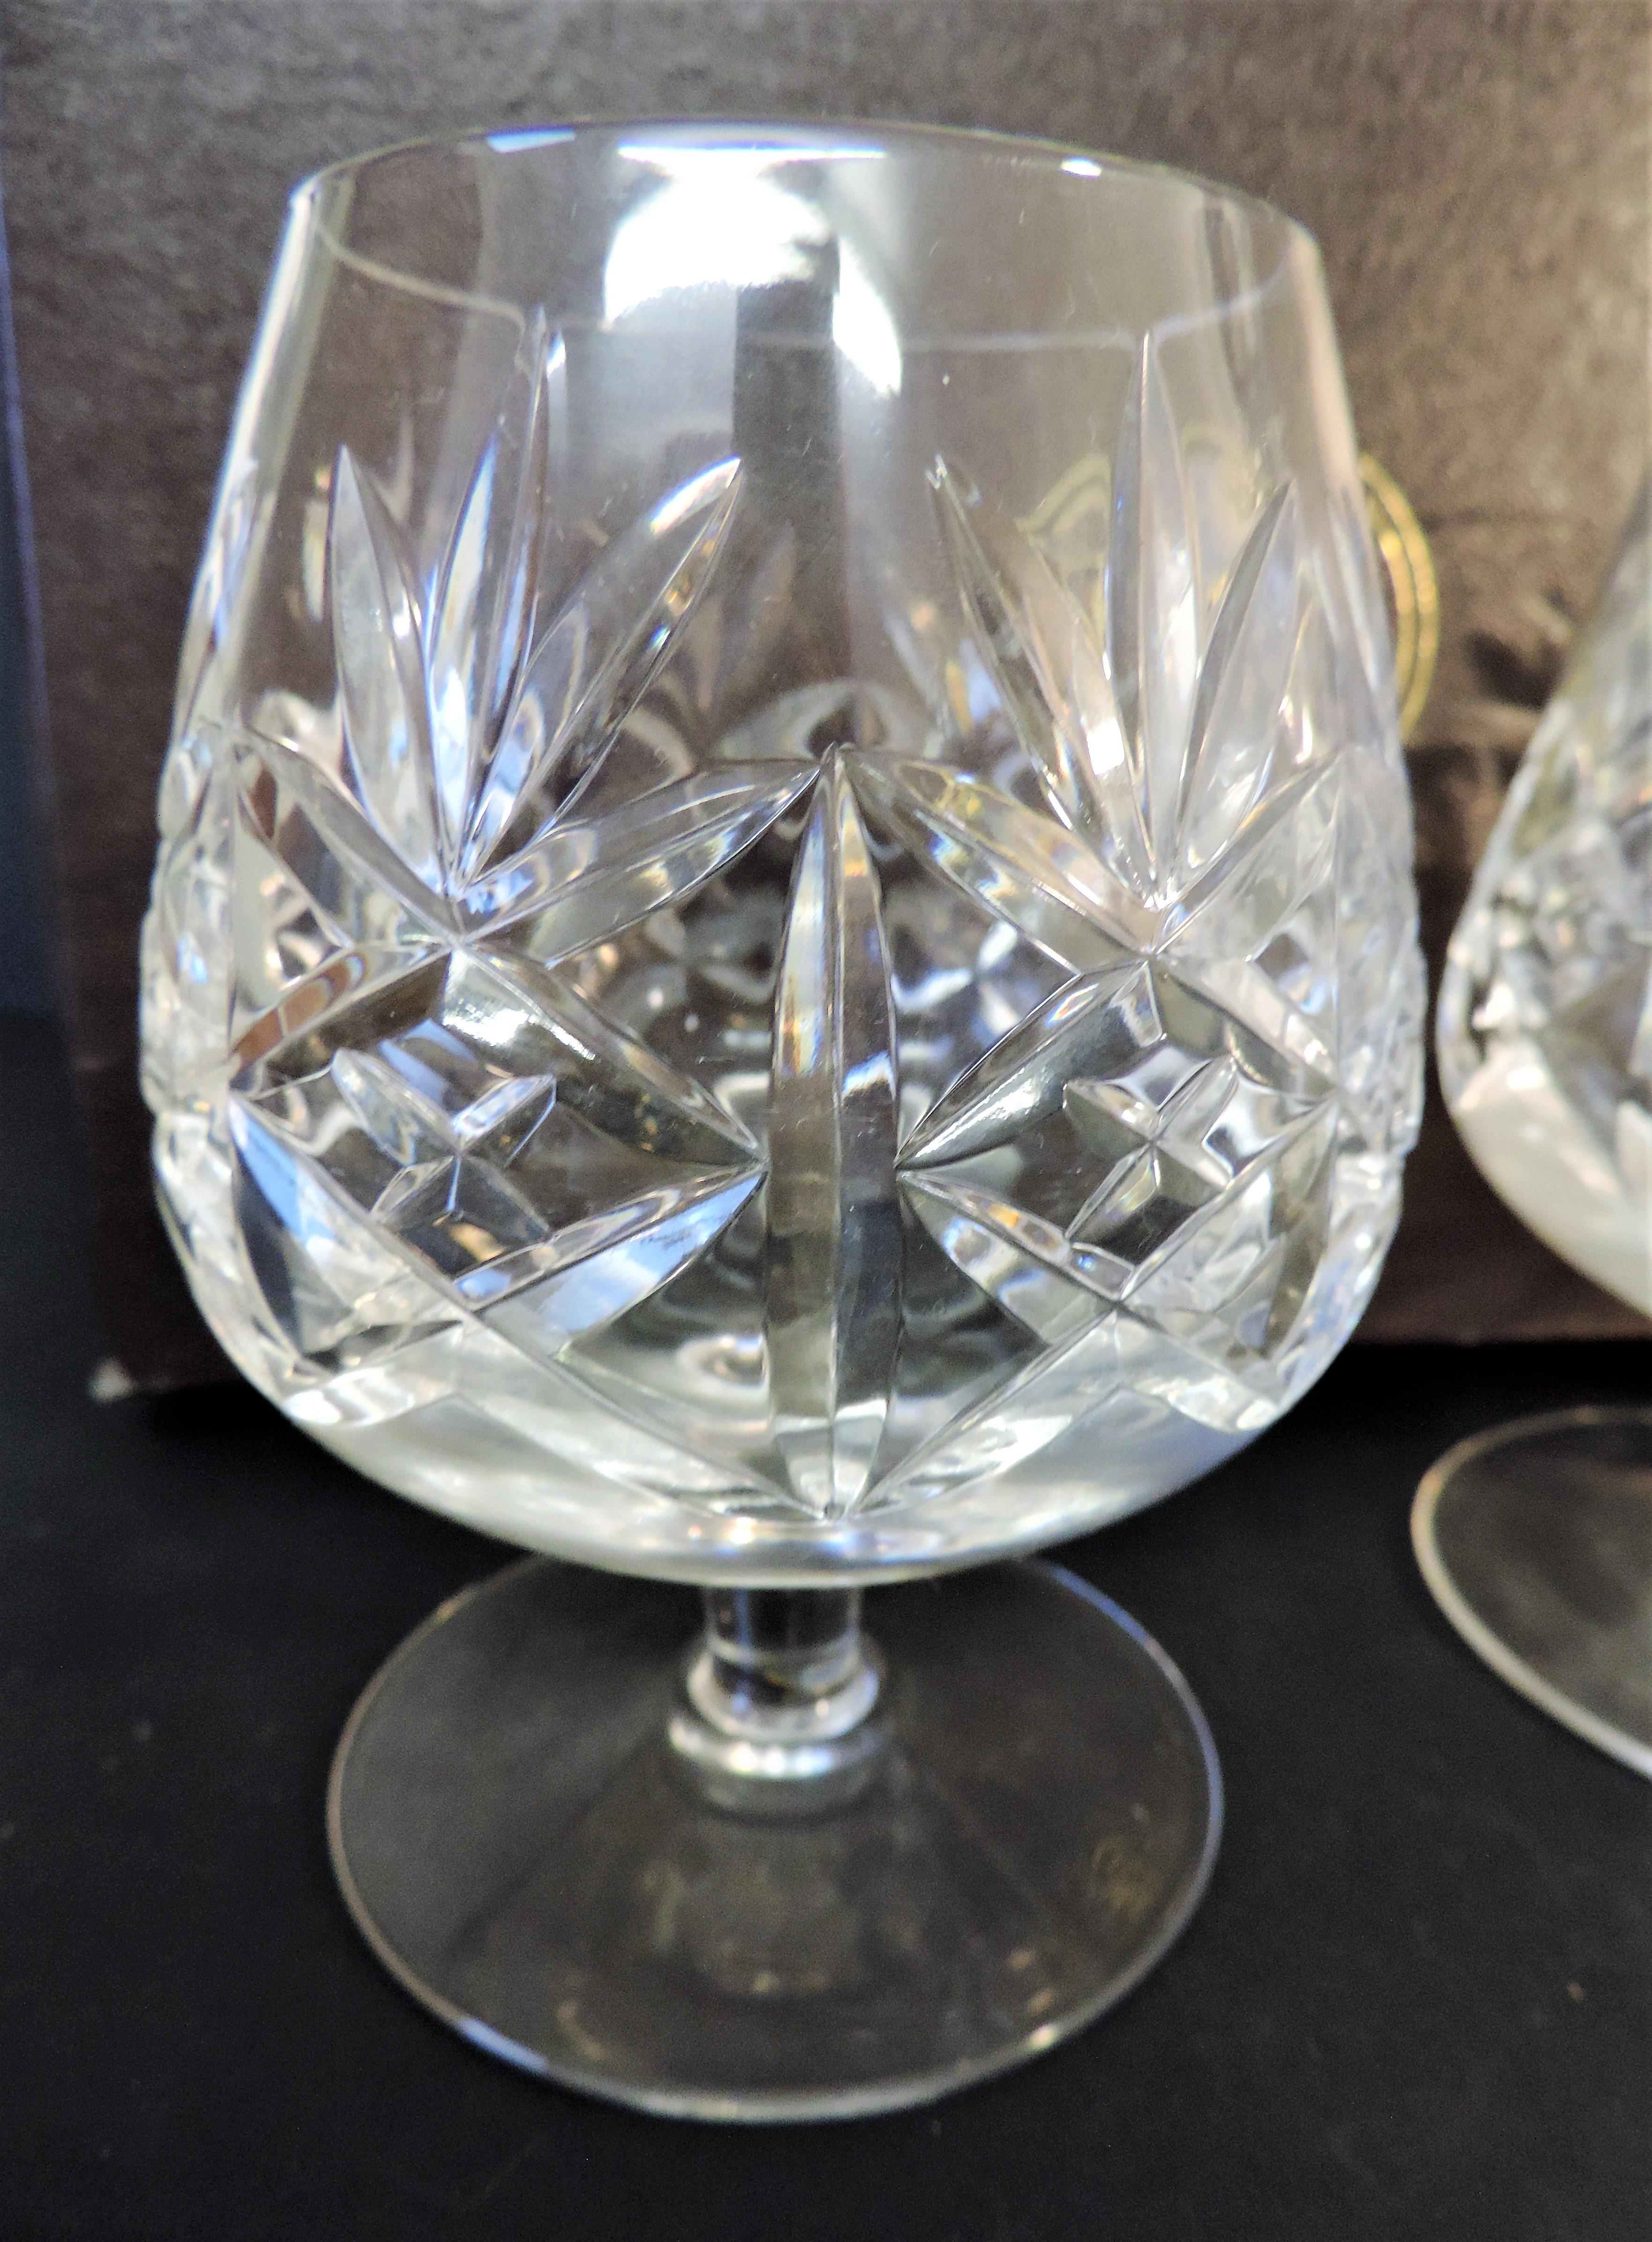 Thomas Webb Crystal Brandy Glasses & Decanter Drinks Set - Image 3 of 4